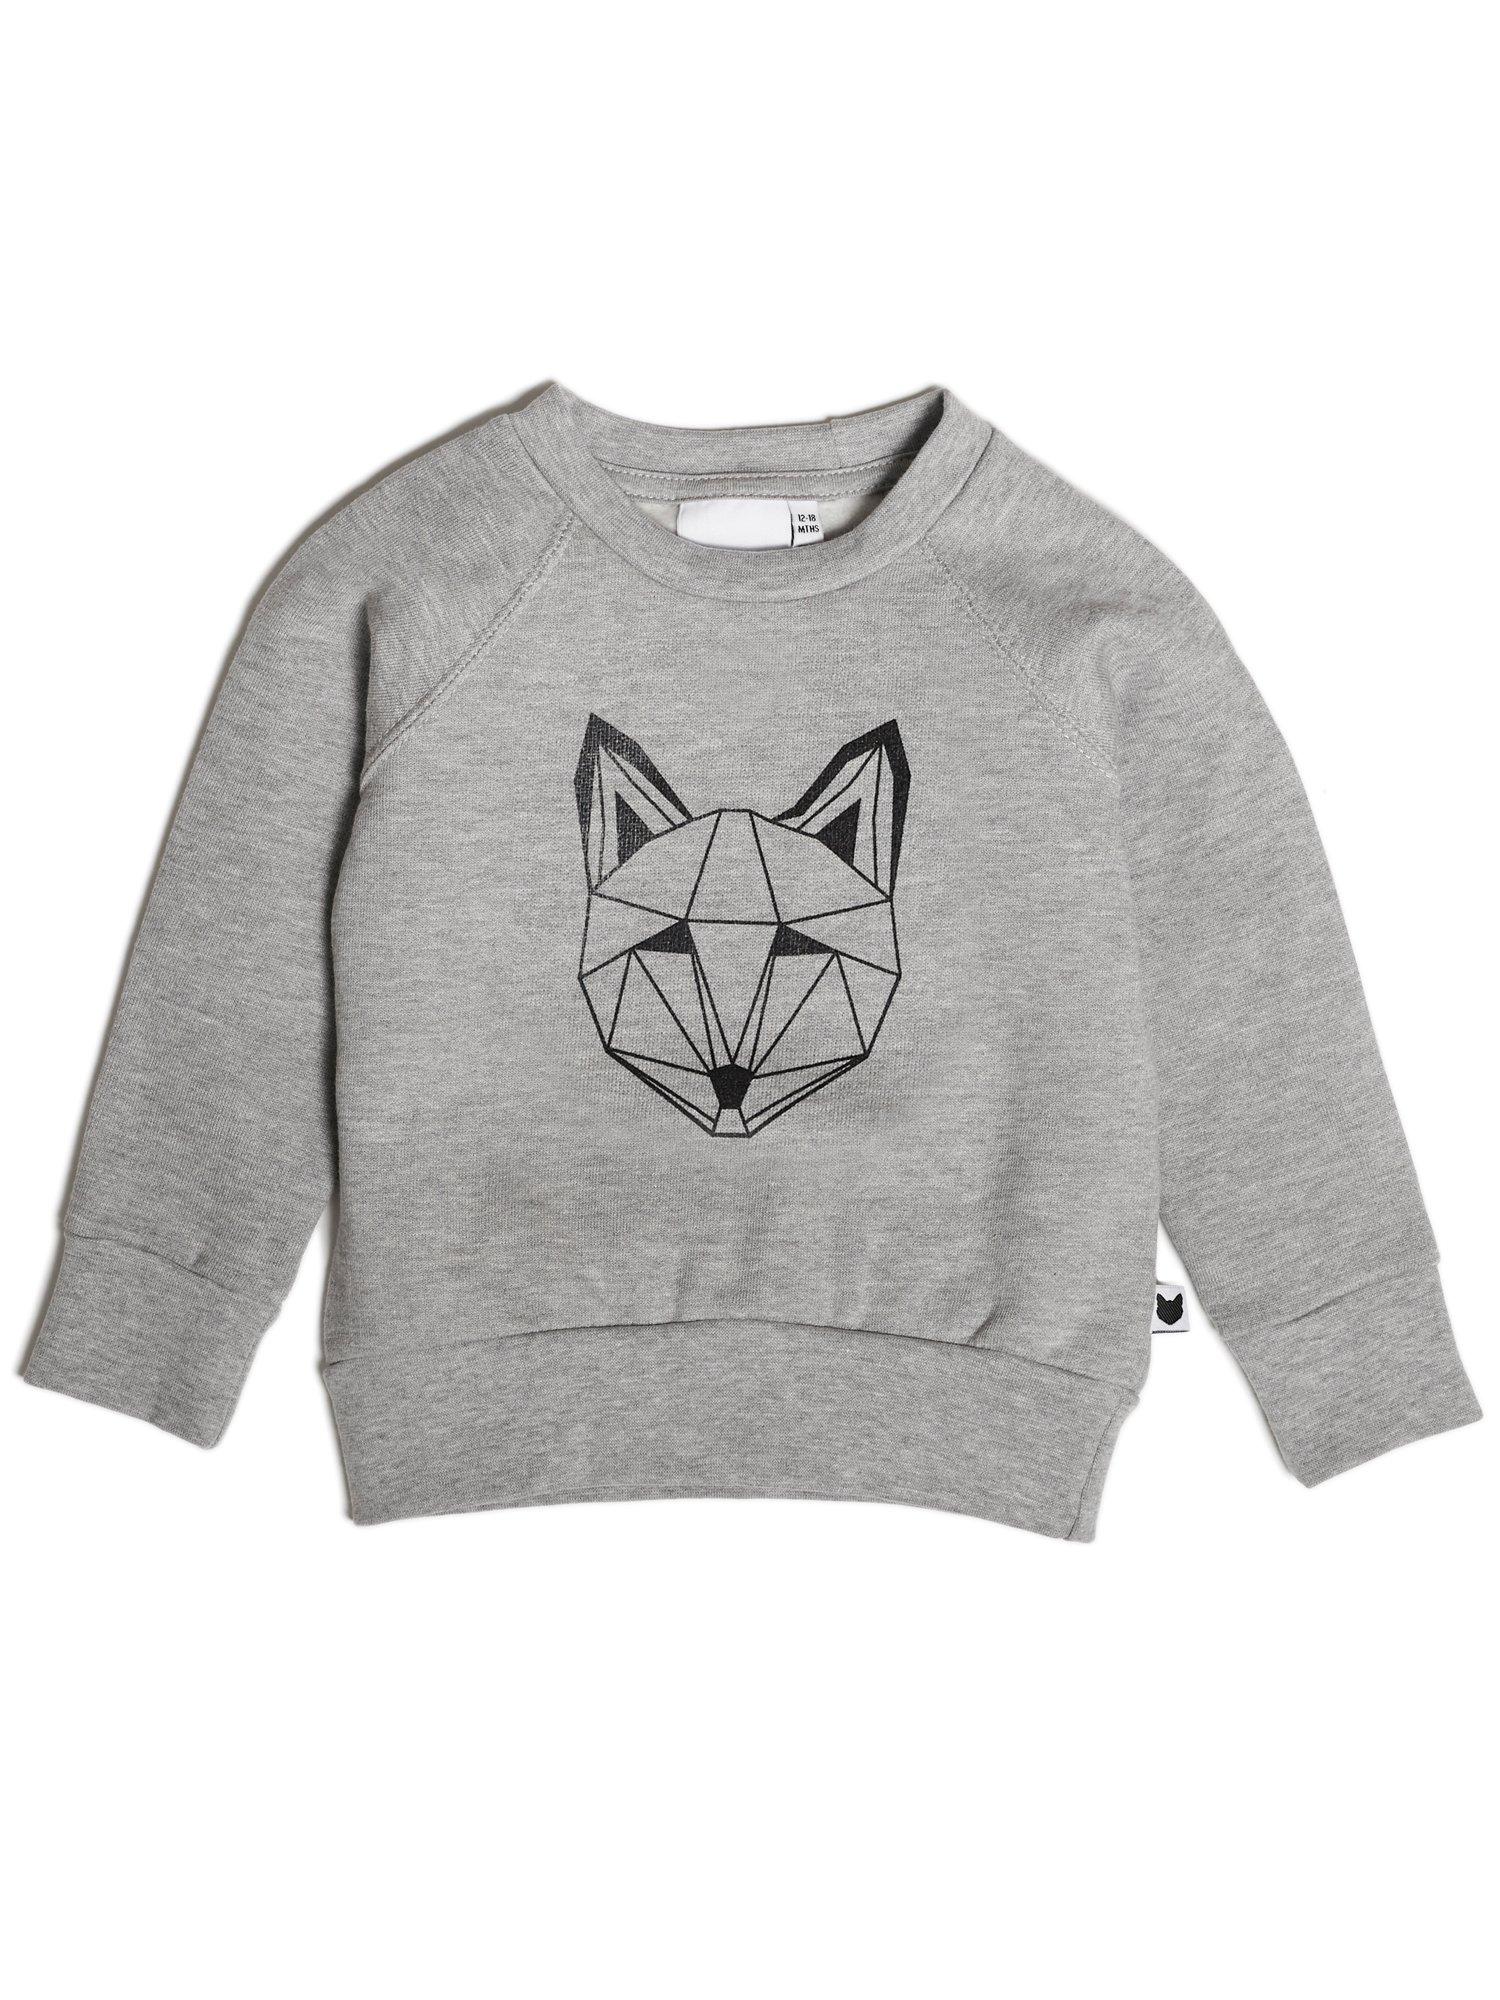 Kids fox sweatshirt